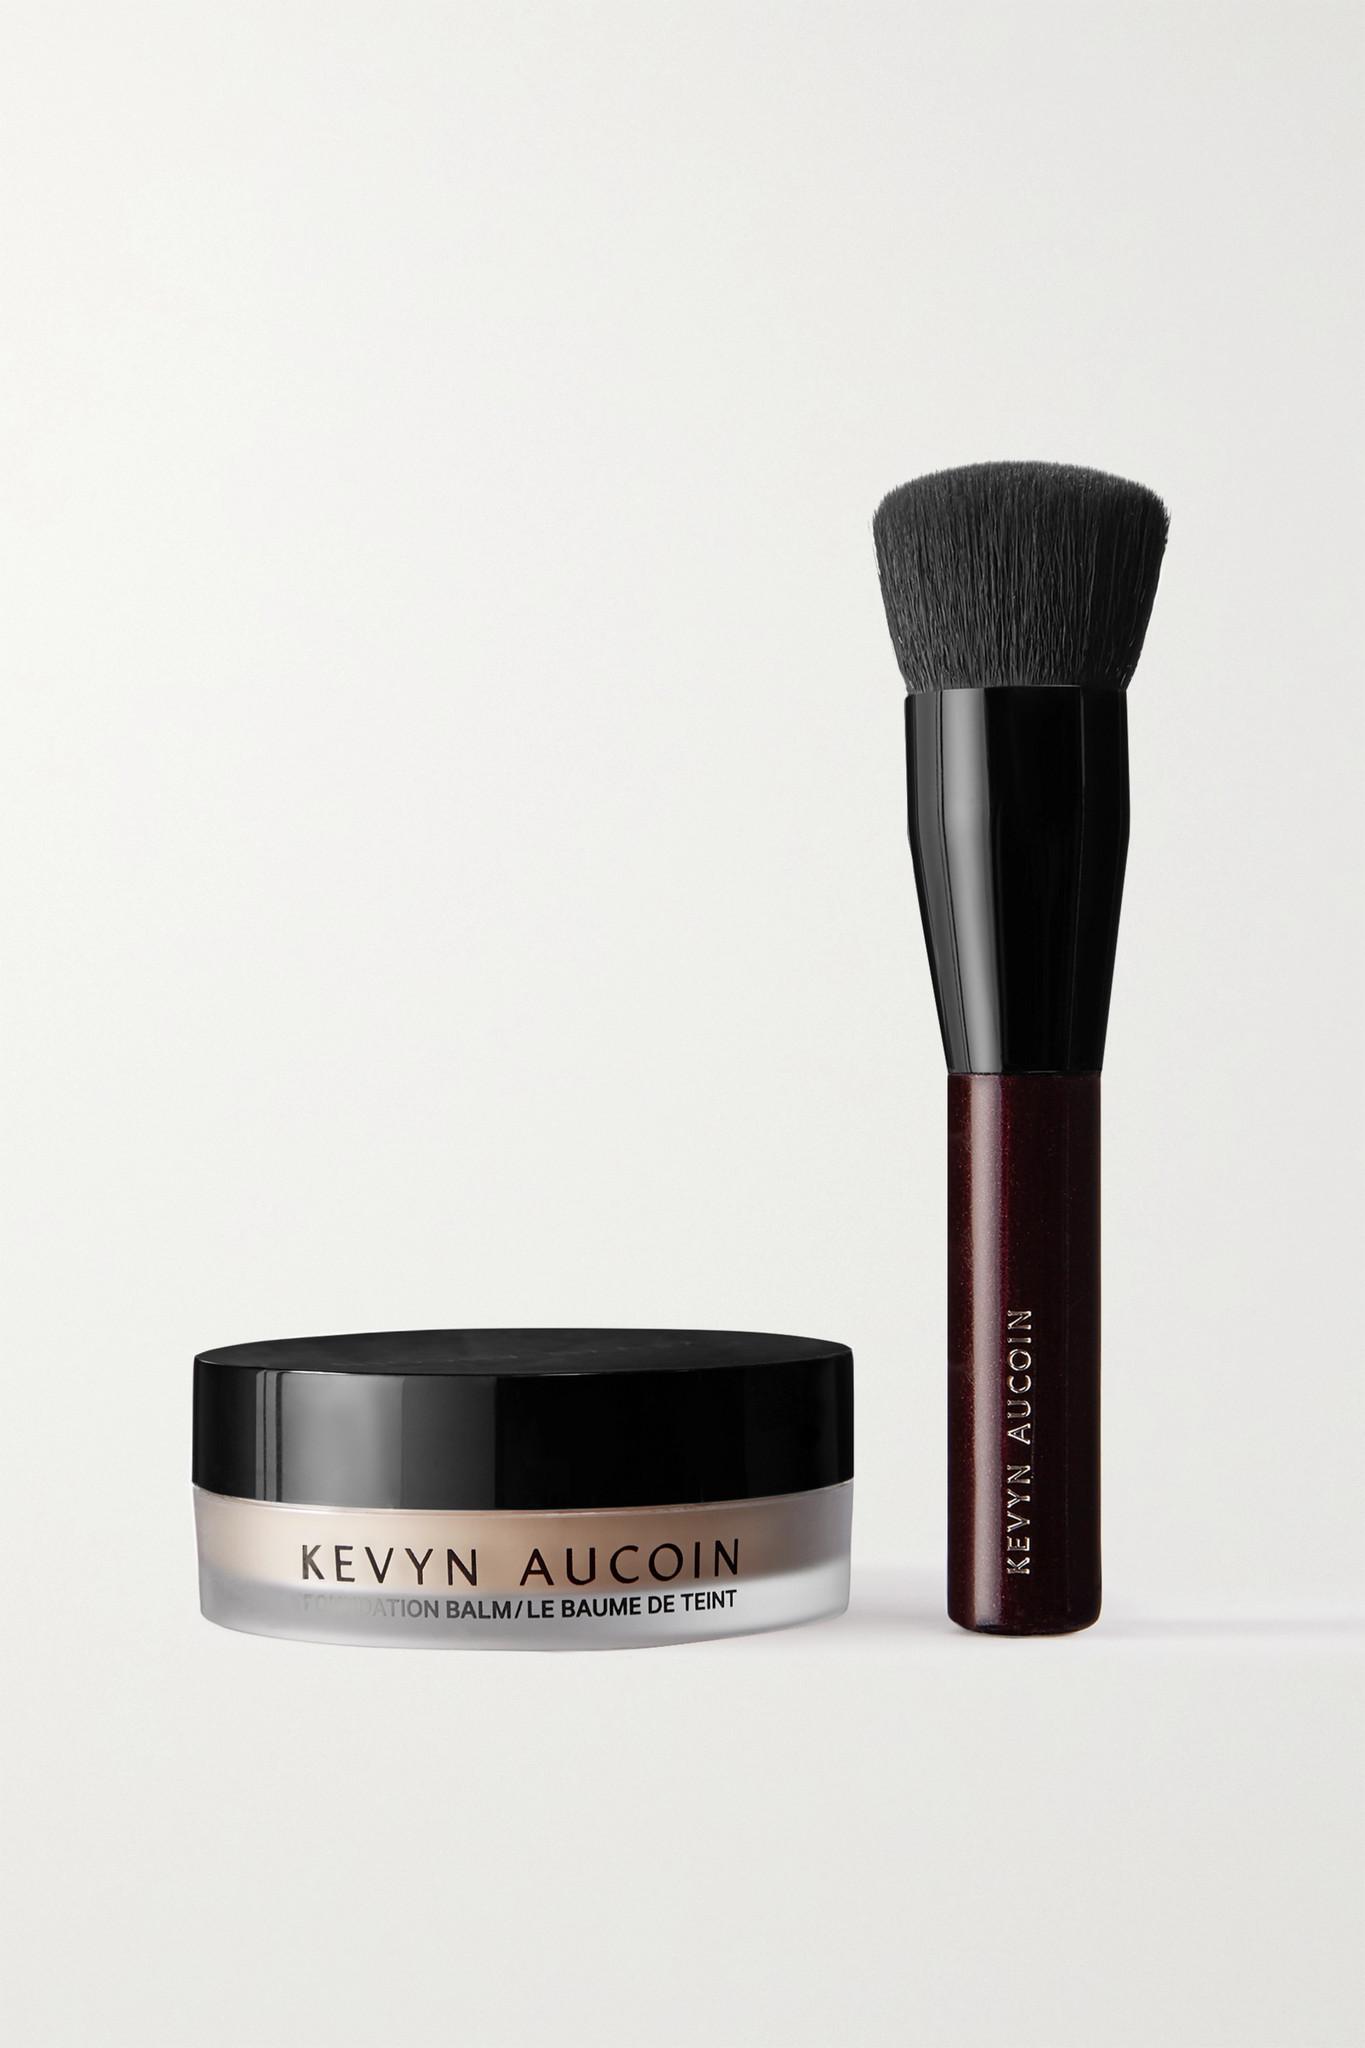 KEVYN AUCOIN - Foundation Balm - Light Fb 03, 22.3g - Neutrals - one size